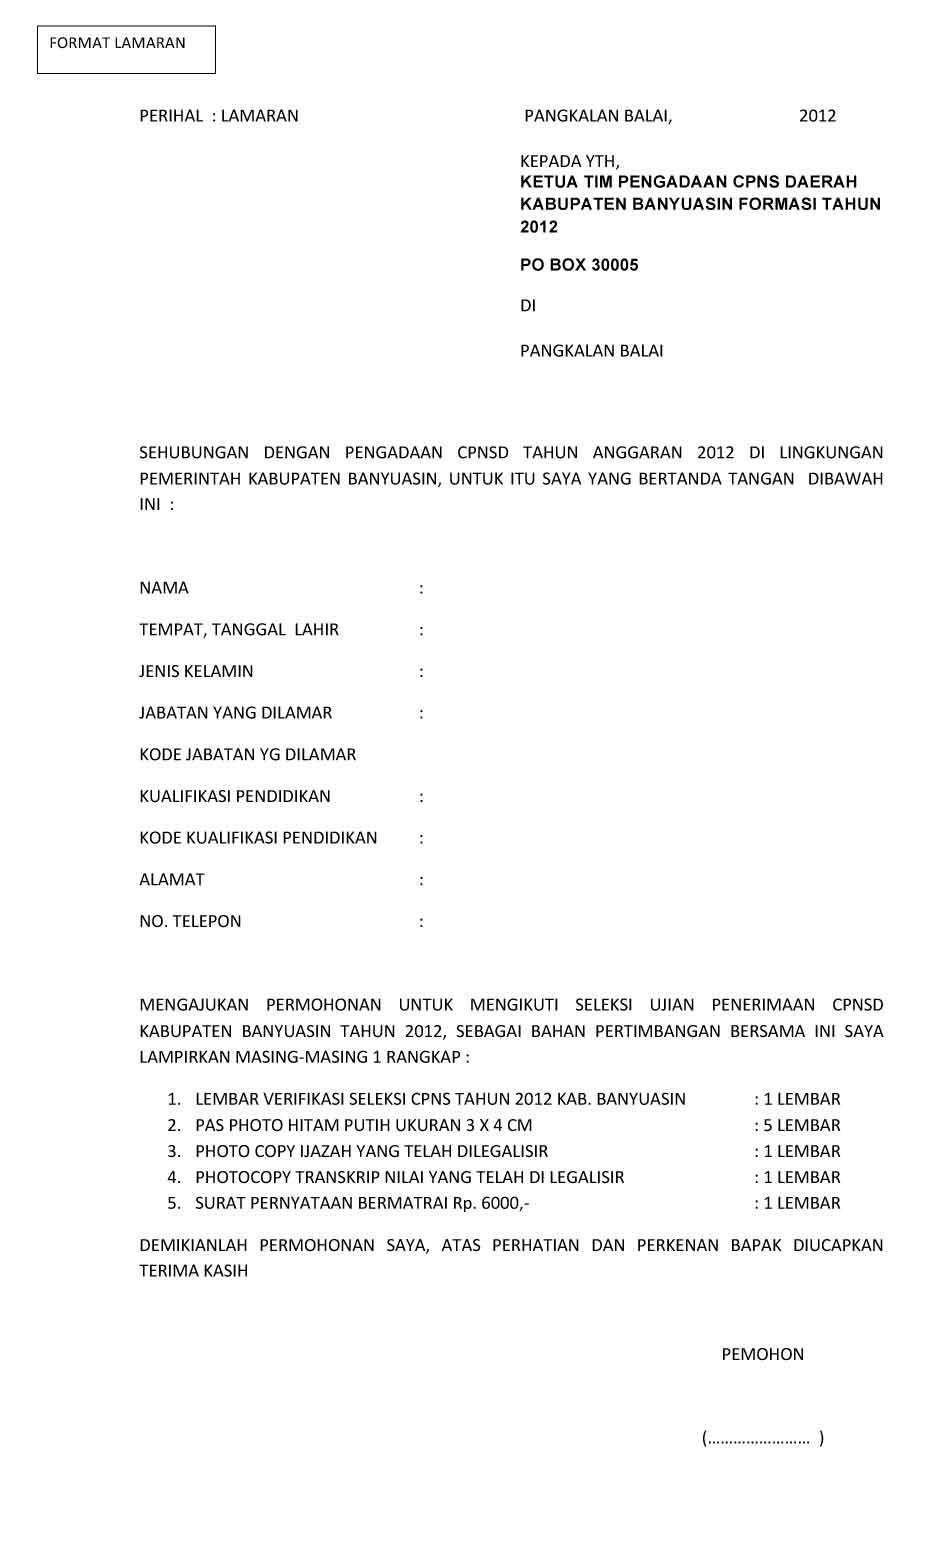 lowongan kerja cpns kab banyuasin ta 2012 2013 juli 2019 terbaru info cpns 2019 bumn 2019